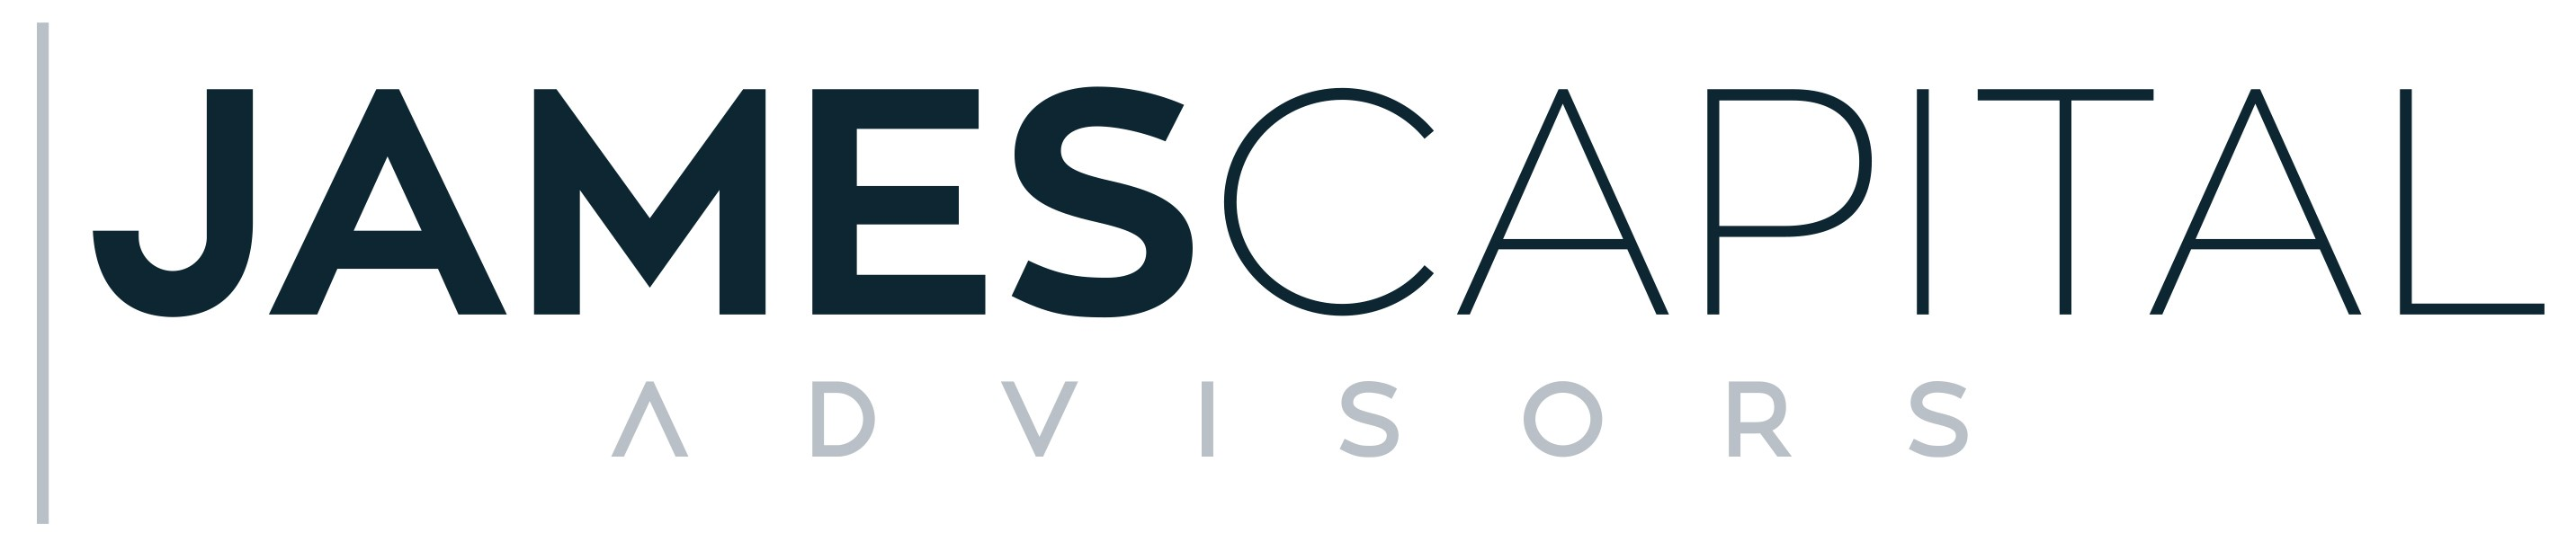 James Capital Advisors Logo